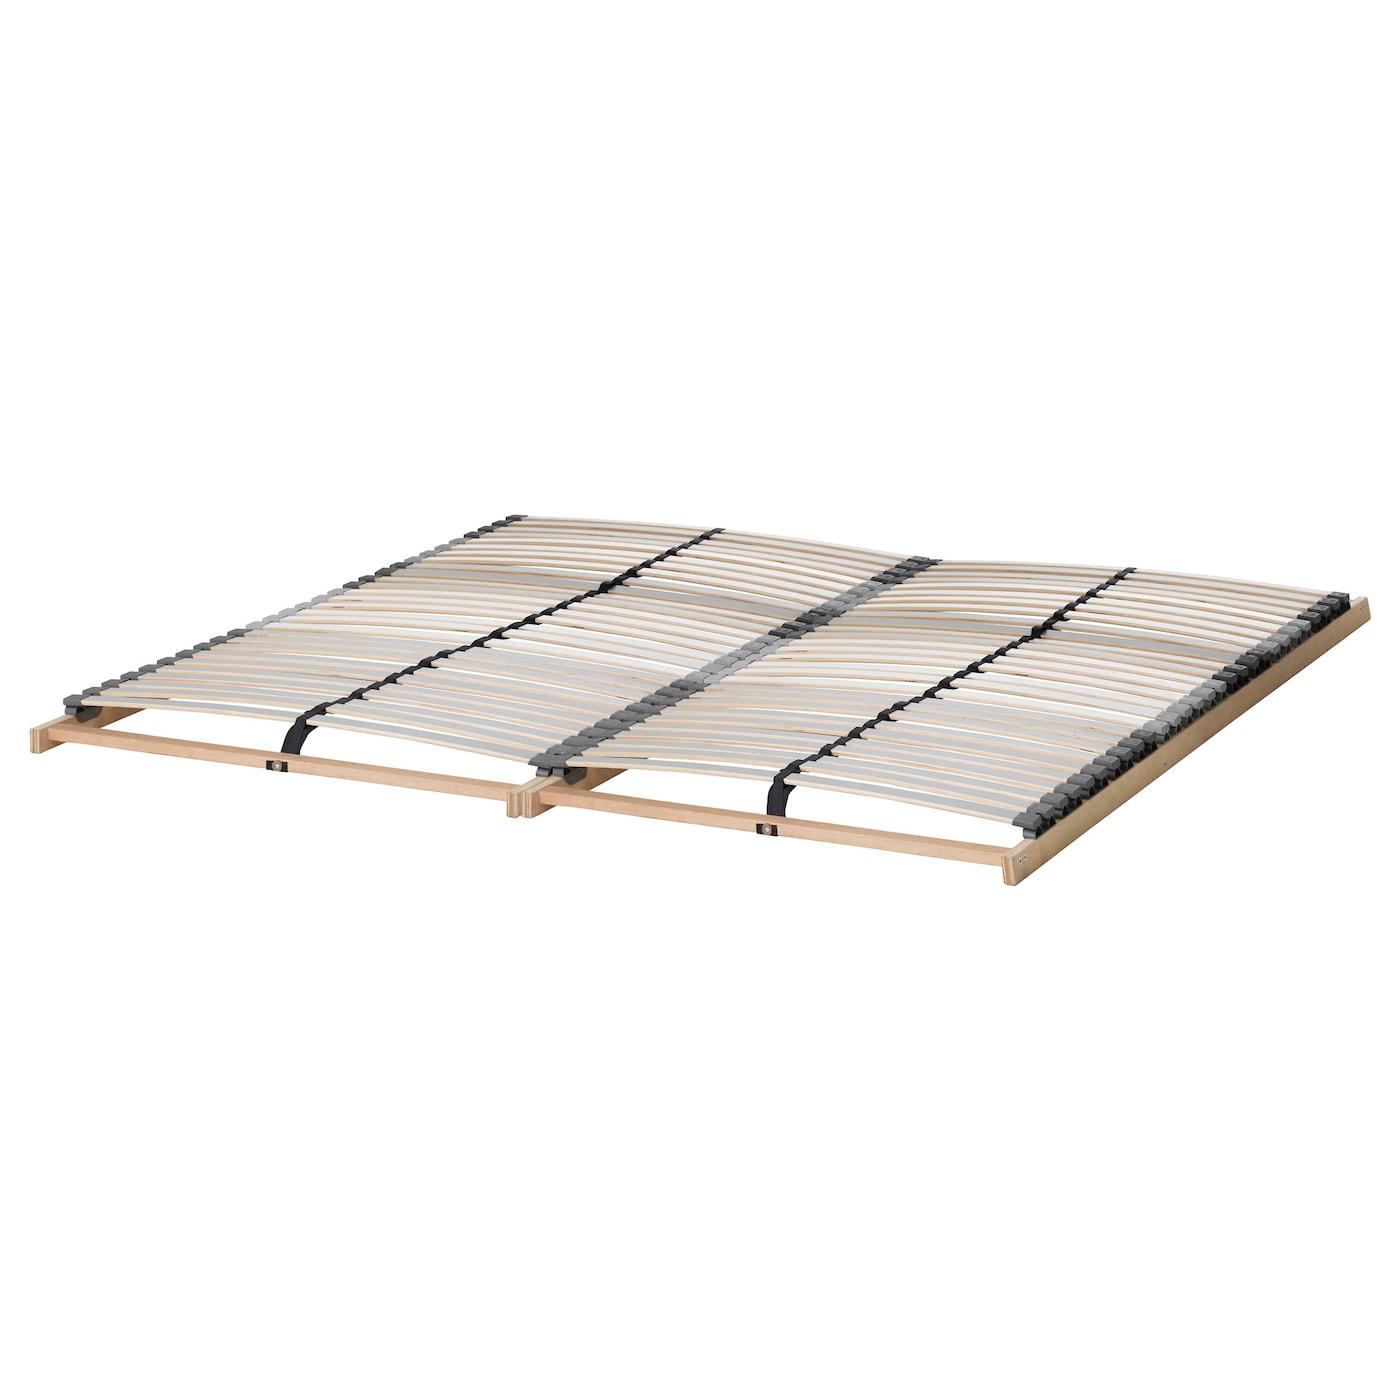 HEMNES Bed frame Blackbrownlnset Standard Double IKEA